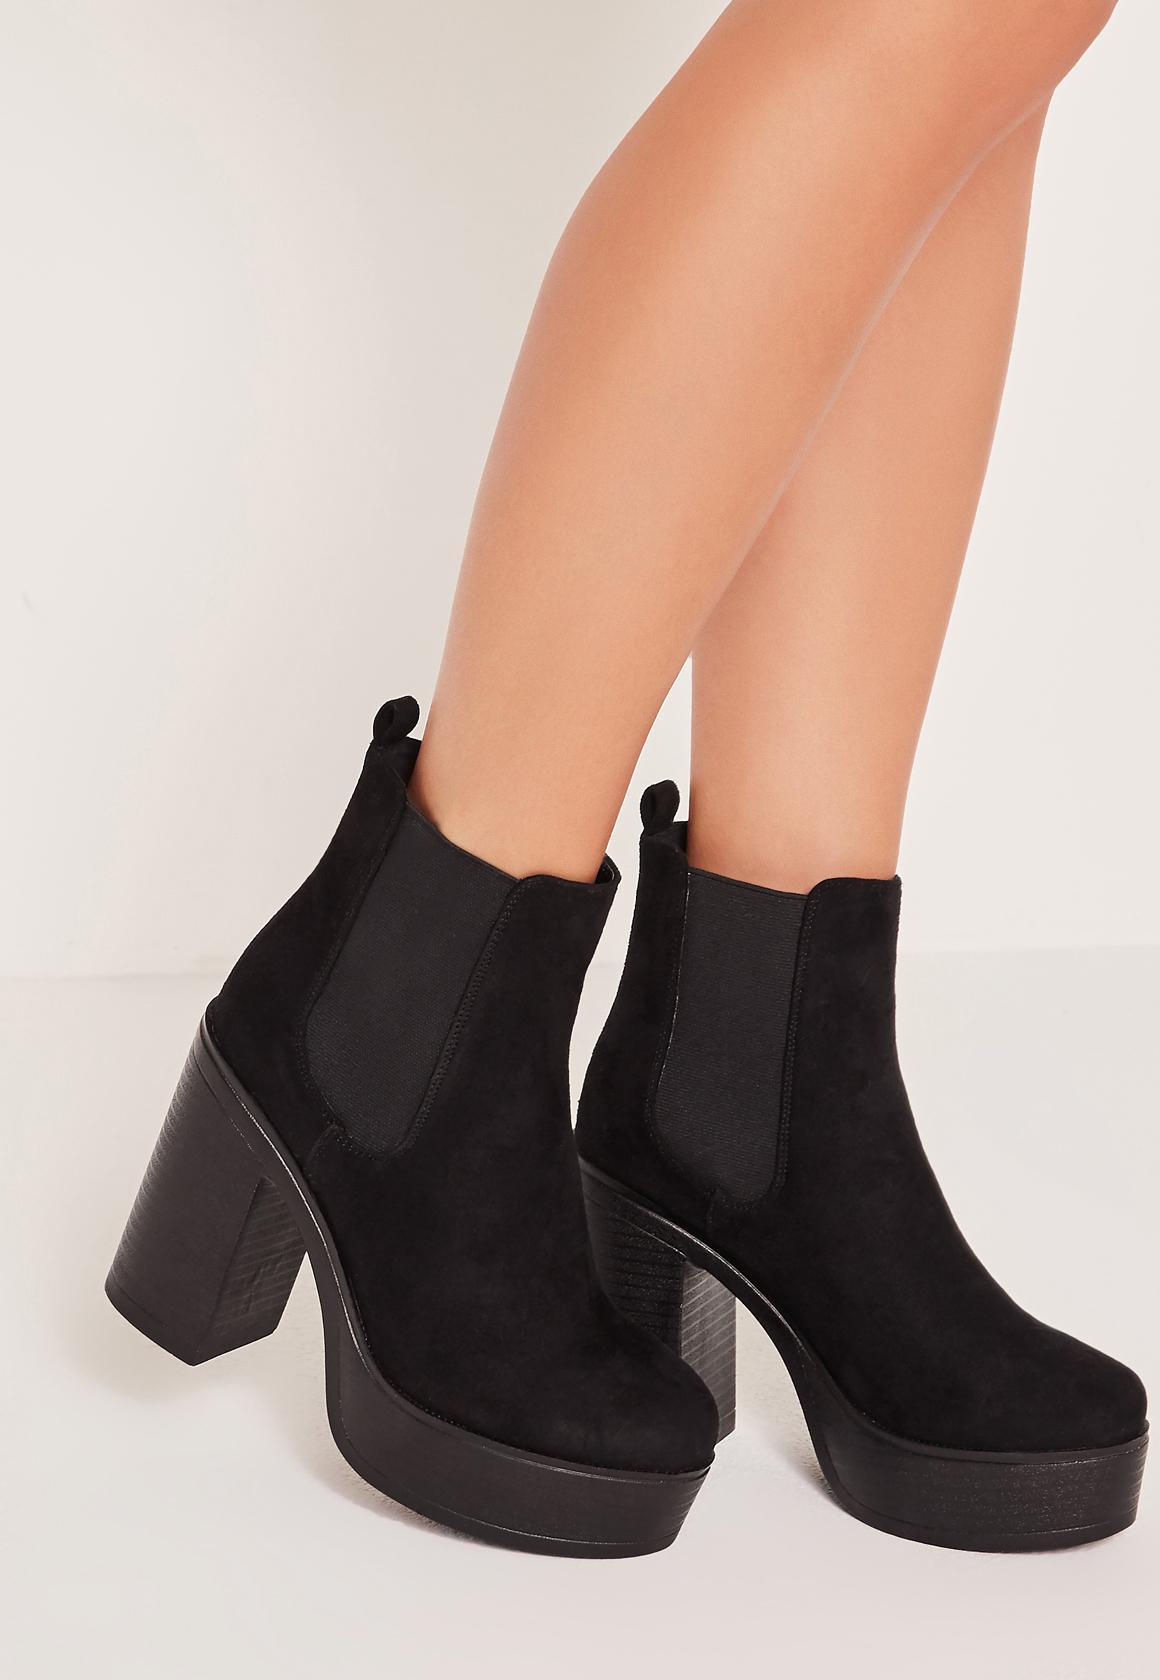 90's Platform Boots Black | Missguided